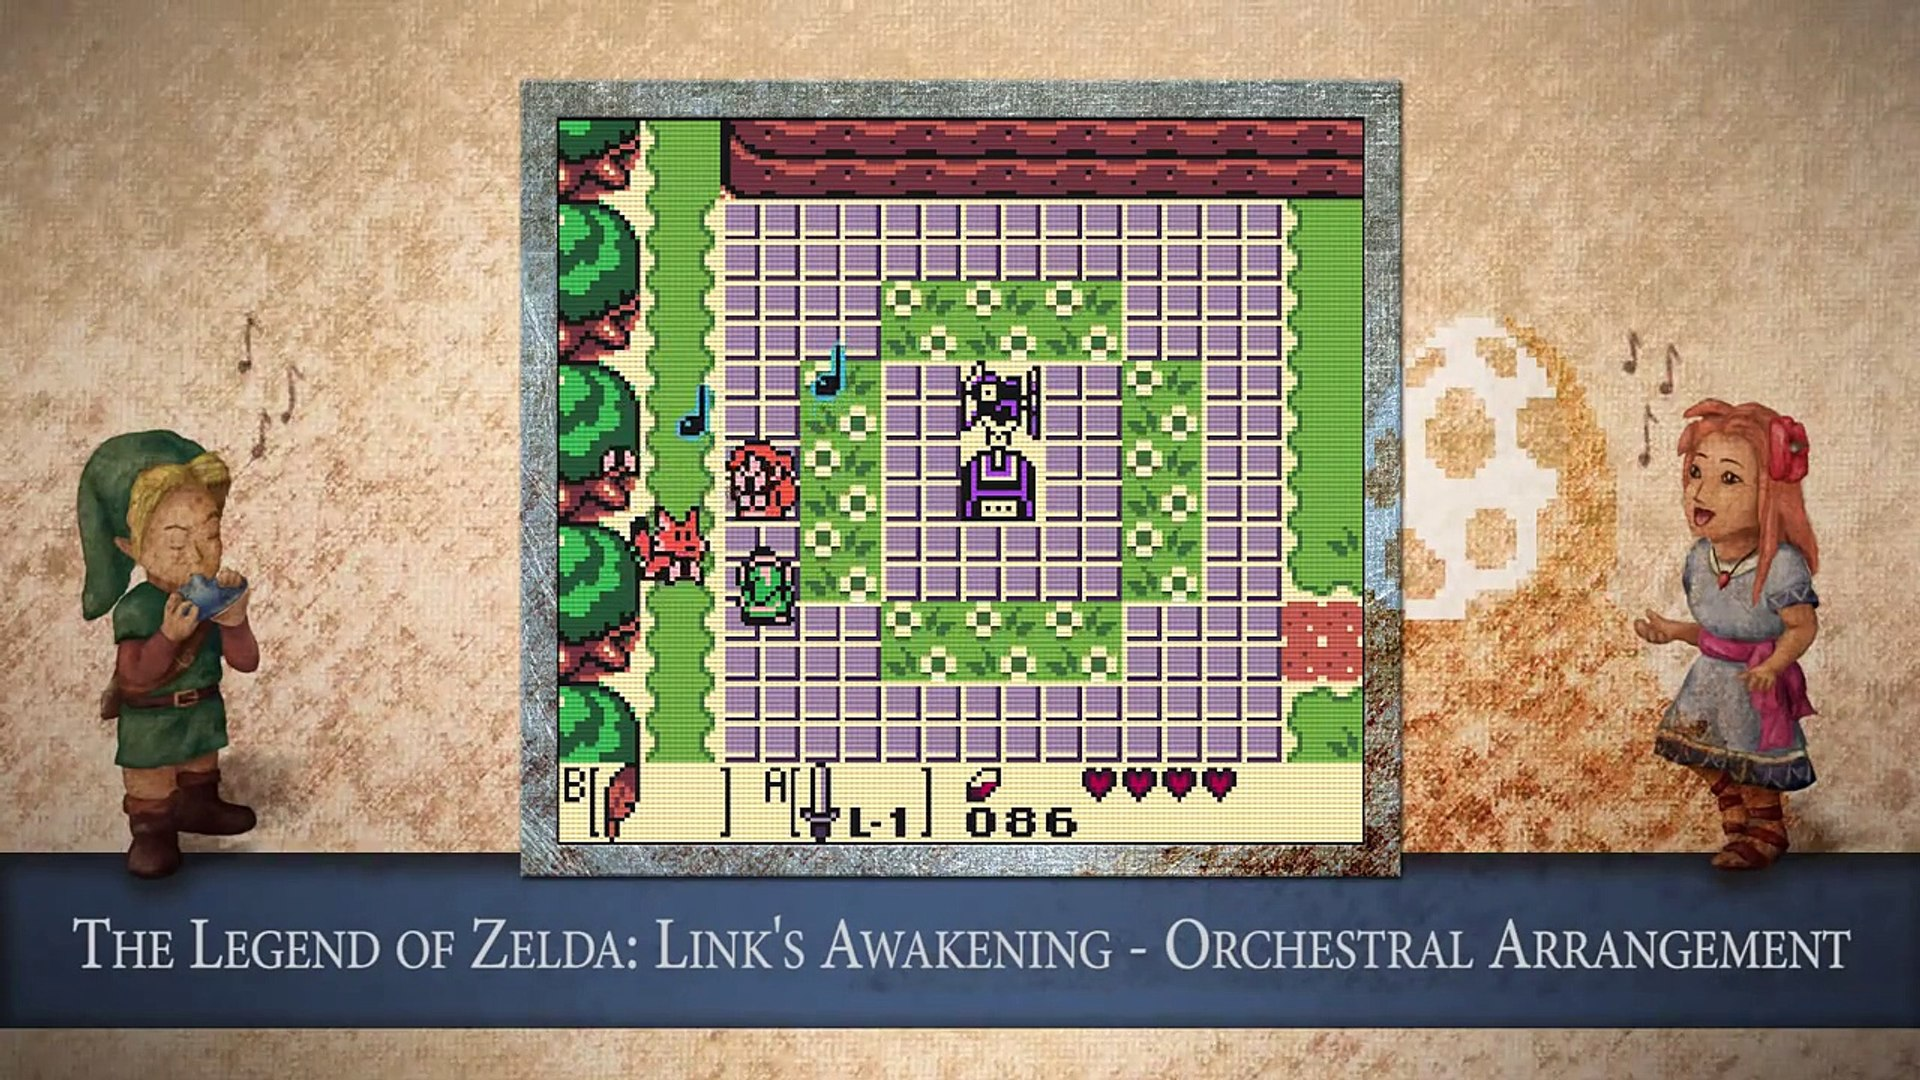 16 Marin Sings Ballad Of The Wind Fish The Legend Of Zelda Link S Awakening Orchestral Arrange